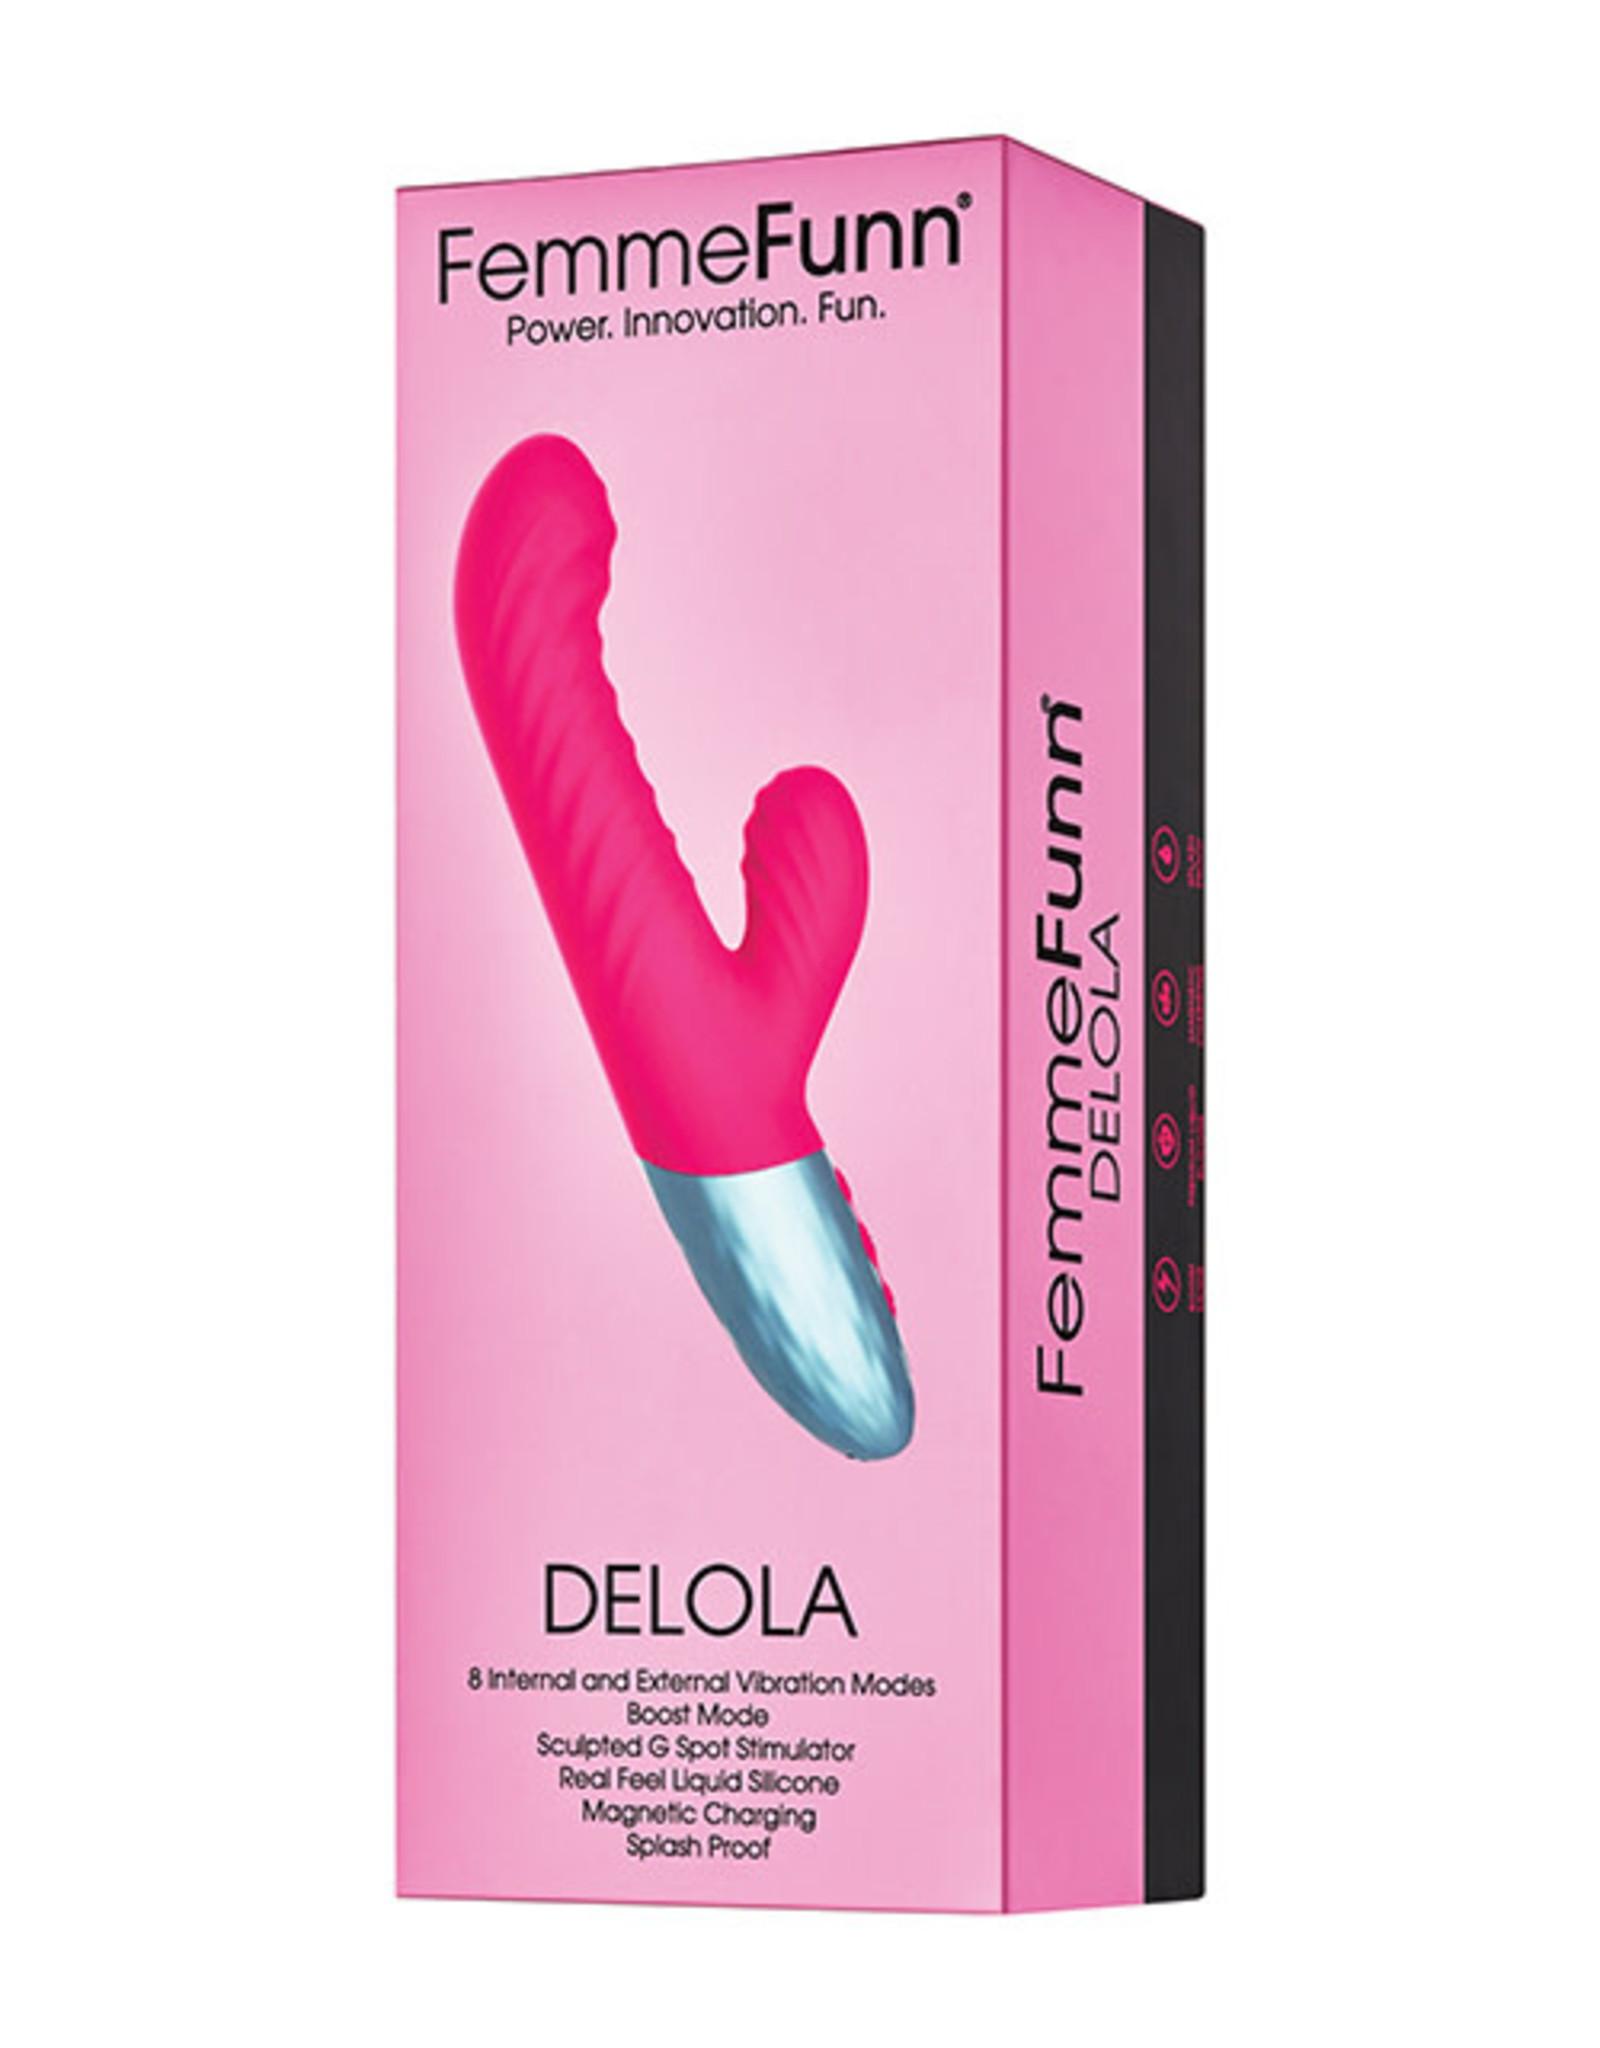 FEMMEFUNN FEMMEFUN - DELOLA - PINK - DOUBLE LAYERD LIQUID SILICONE RABBIT